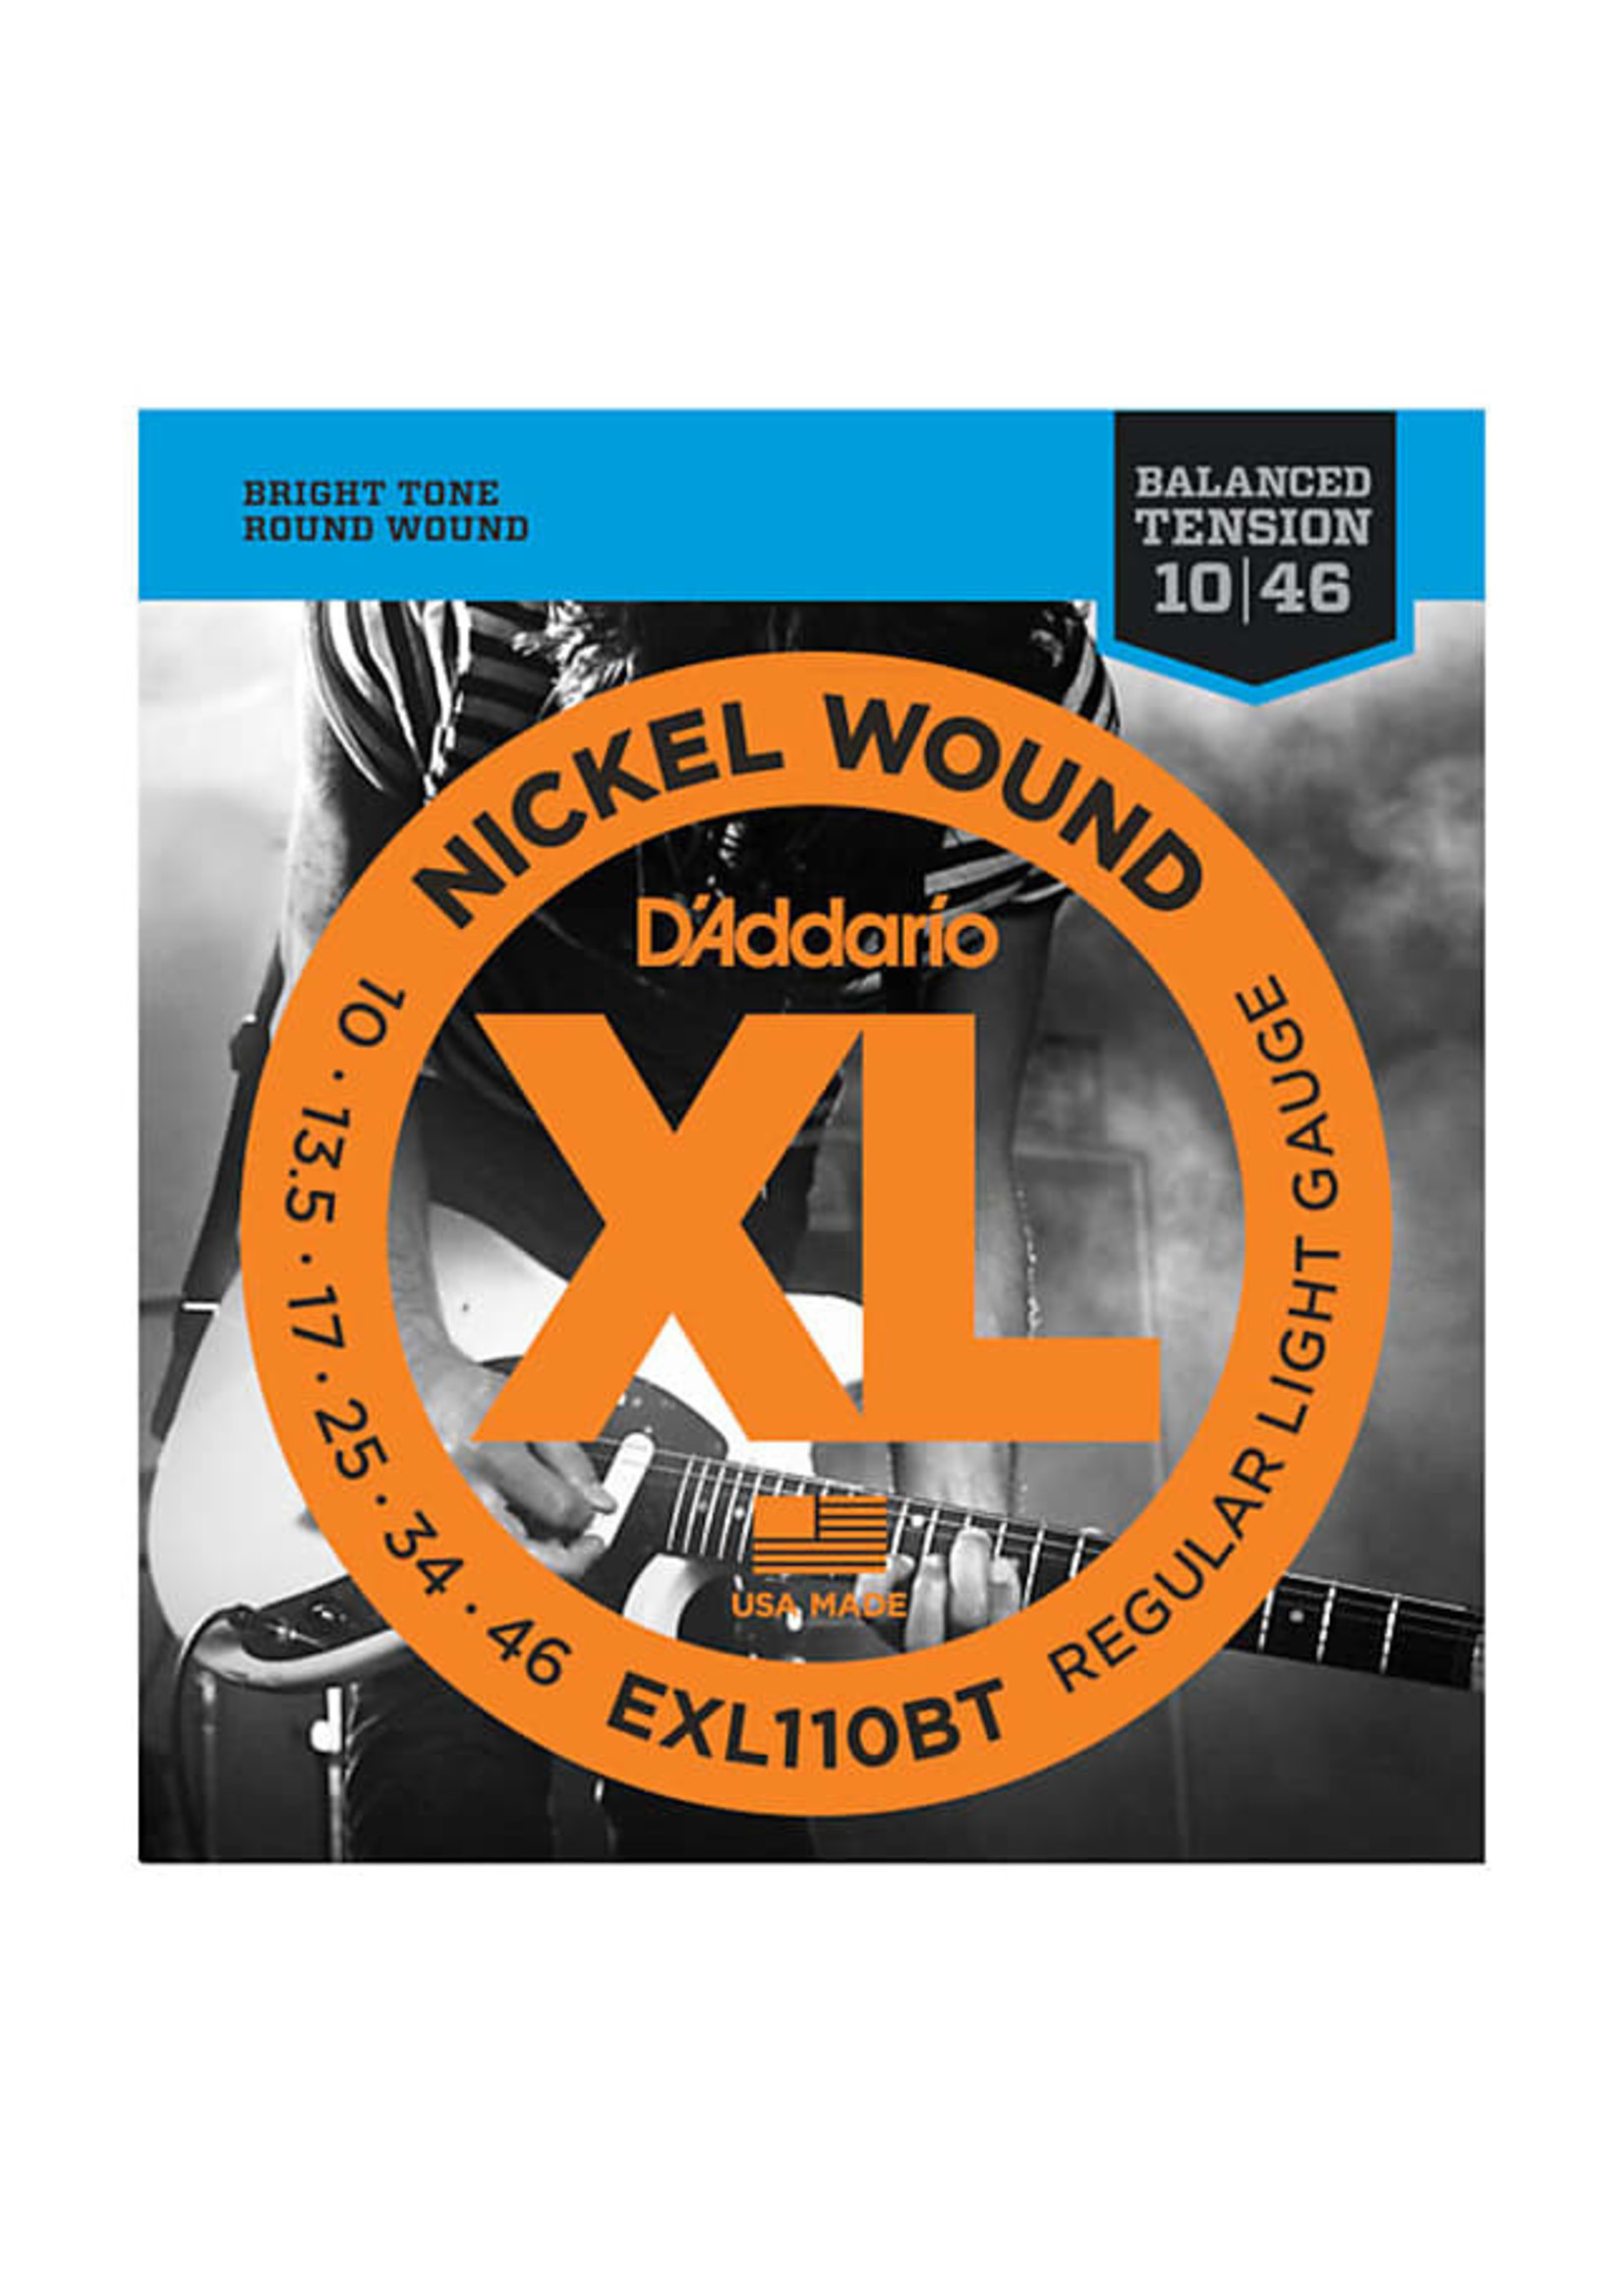 D'Addario D'Addario EXL110BT Nickel Wound, Balanced Tension Regular Light, 10-46